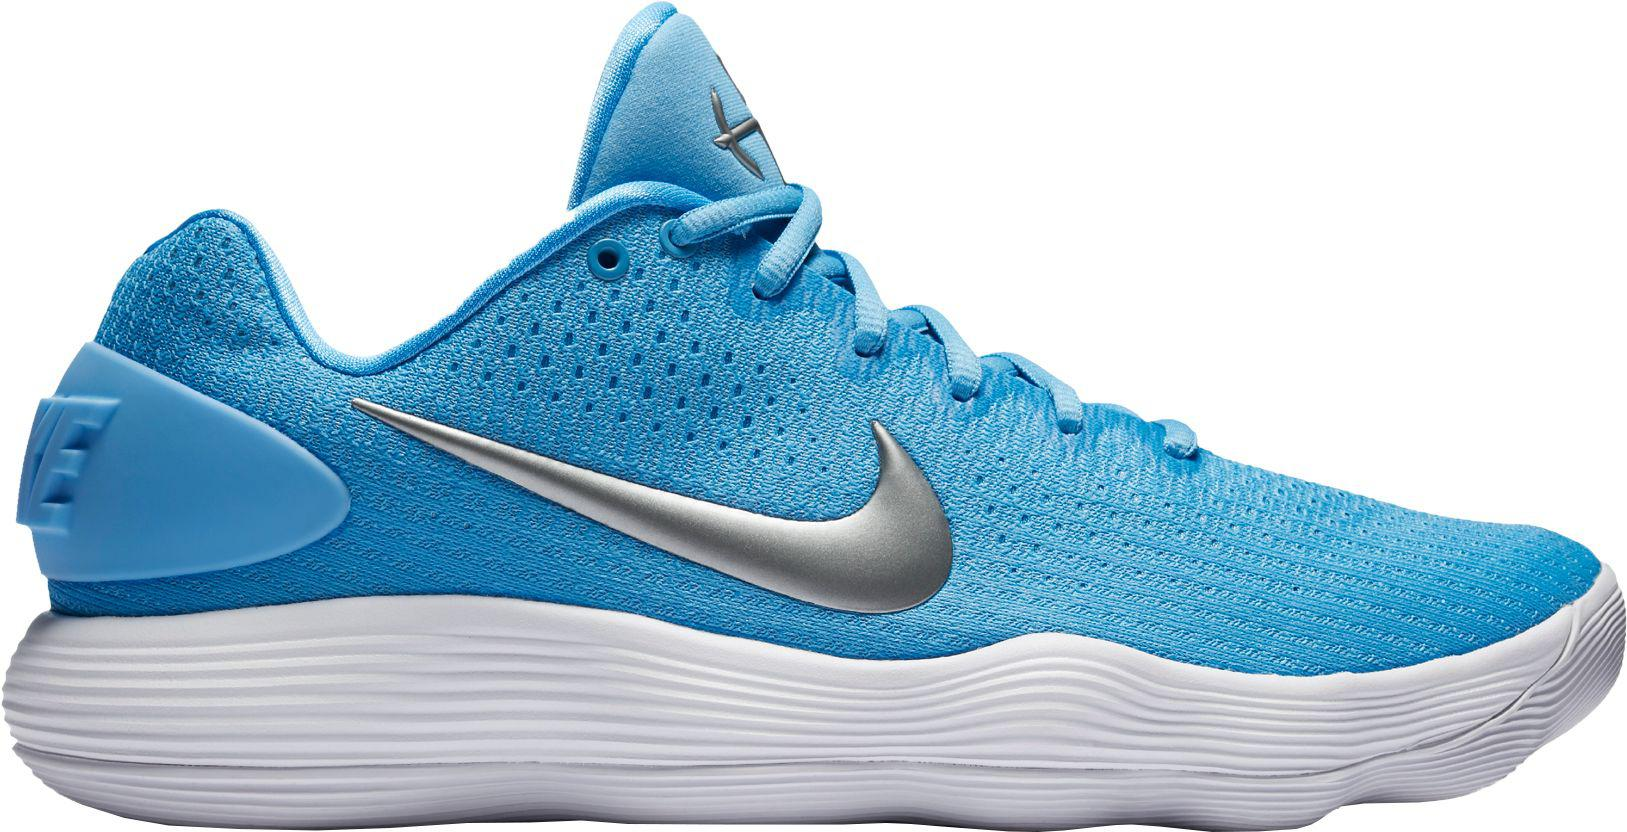 defcb80094e Lyst - Nike React Hyperdunk 2017 Low Basketball Shoes in Blue for Men